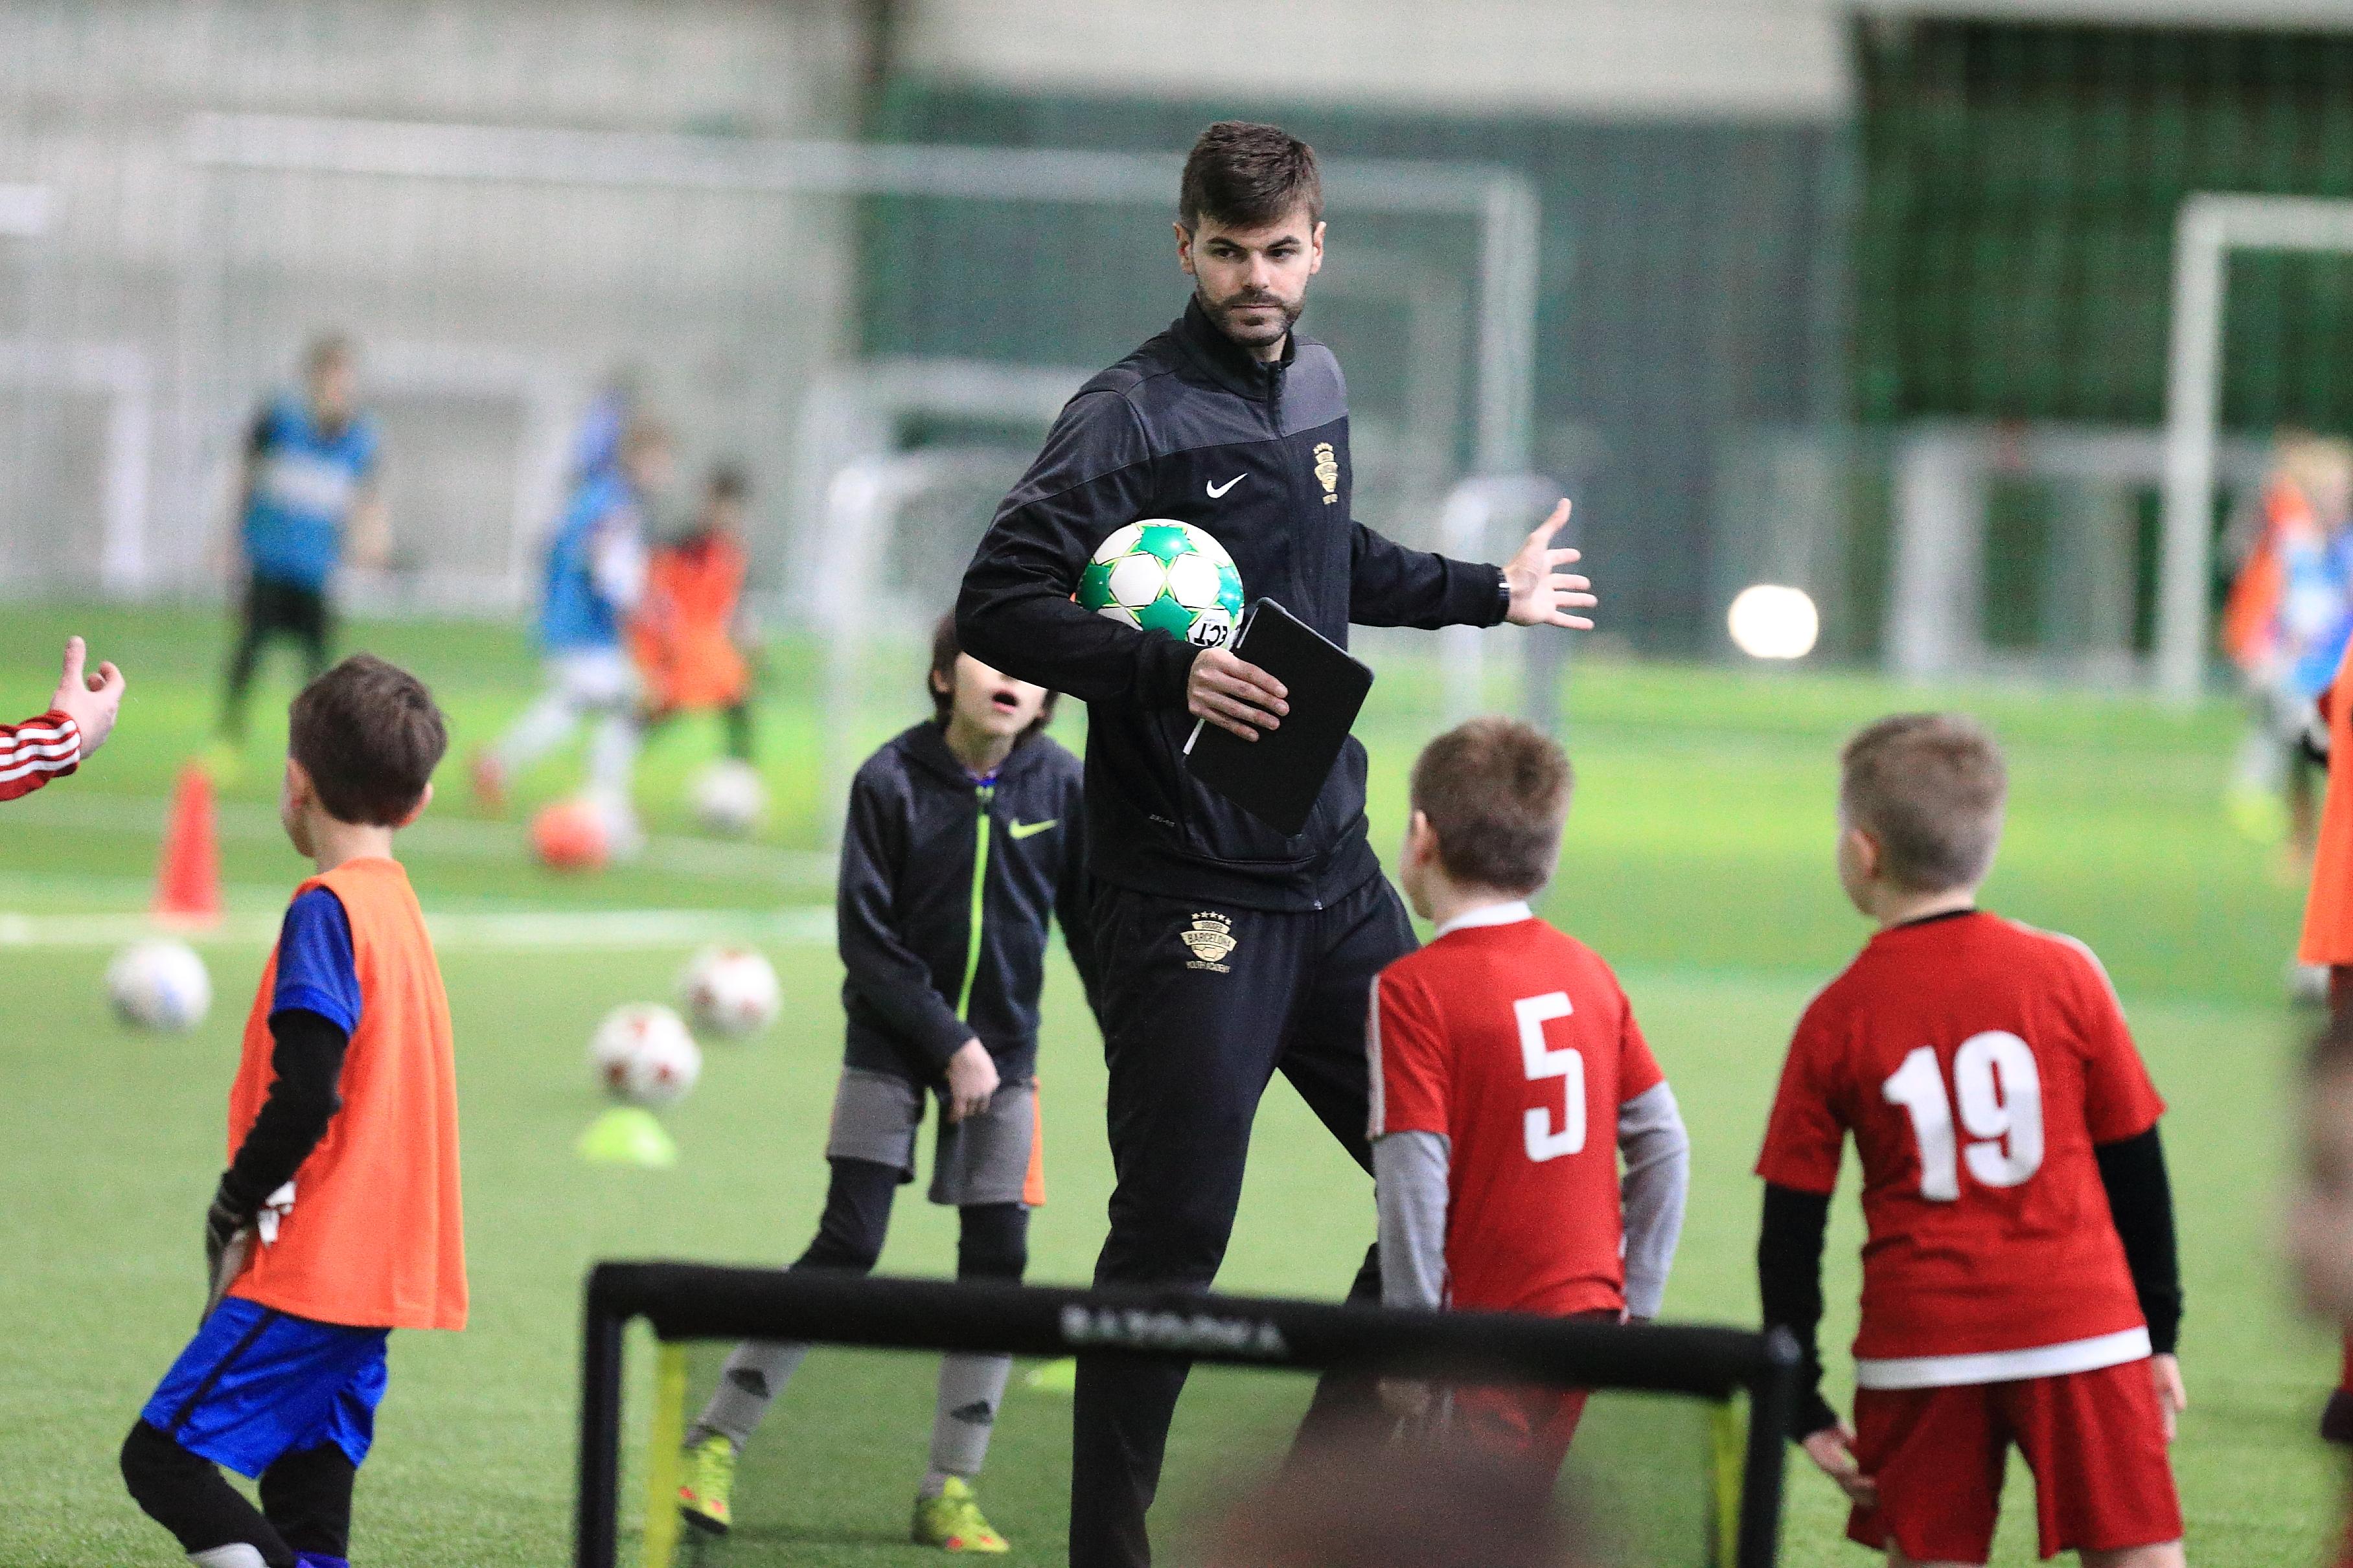 Dany Ayats, Football Lessons Vilnius 2017